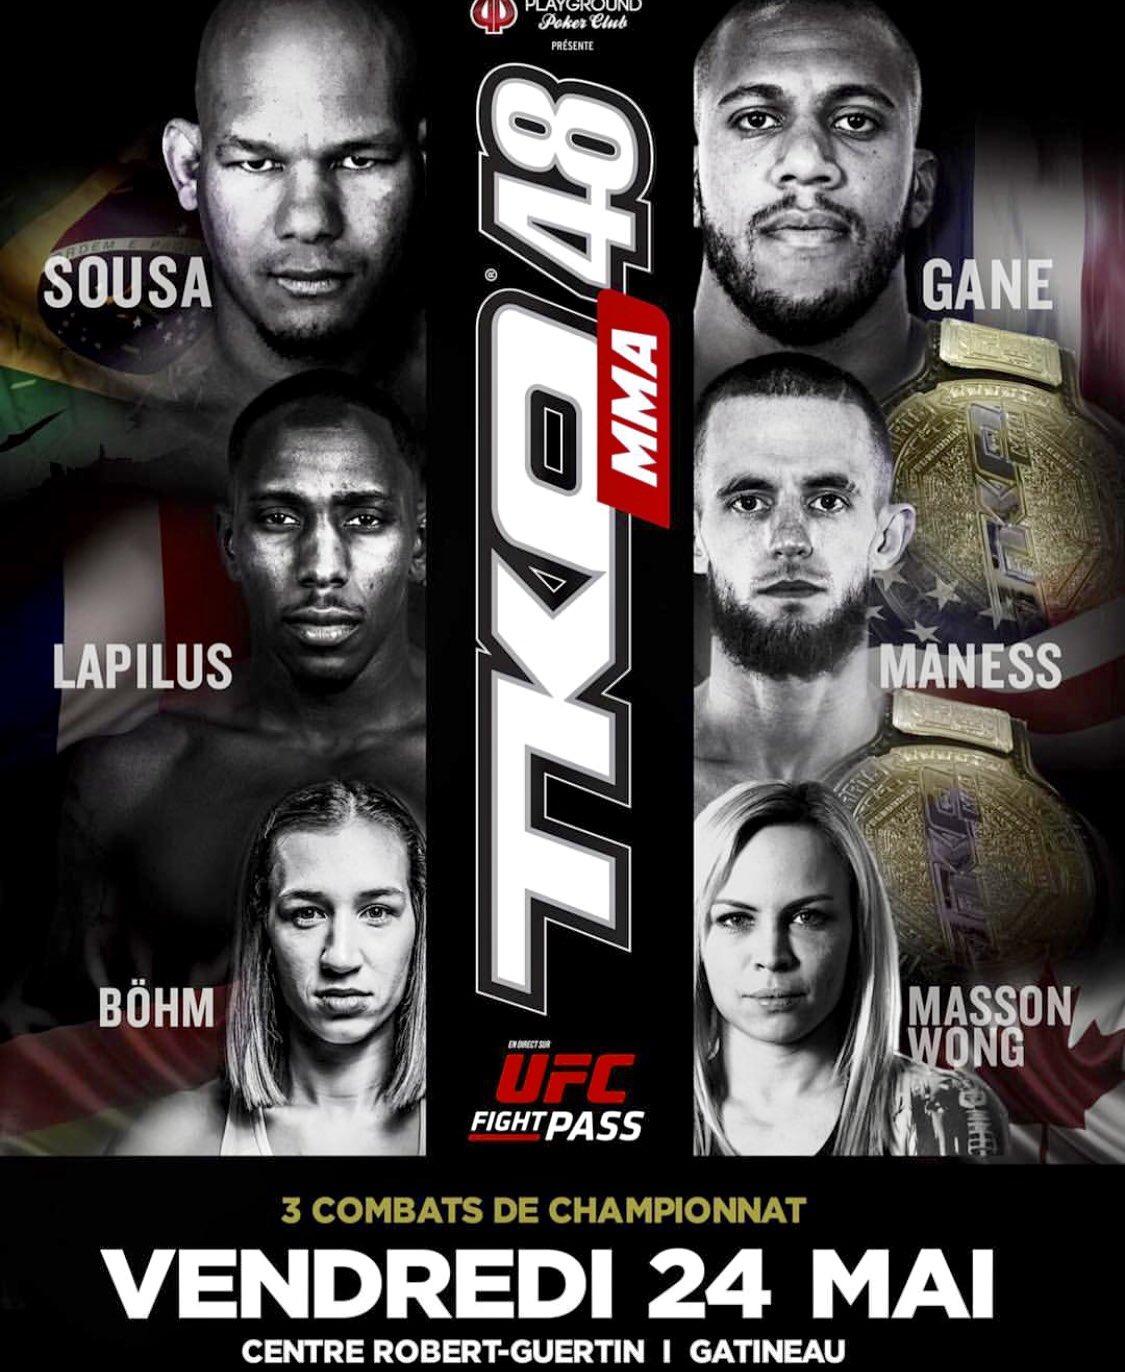 TKO 48 Ciryl Gane Vs Roggers Souza May 24 Discussion, Live